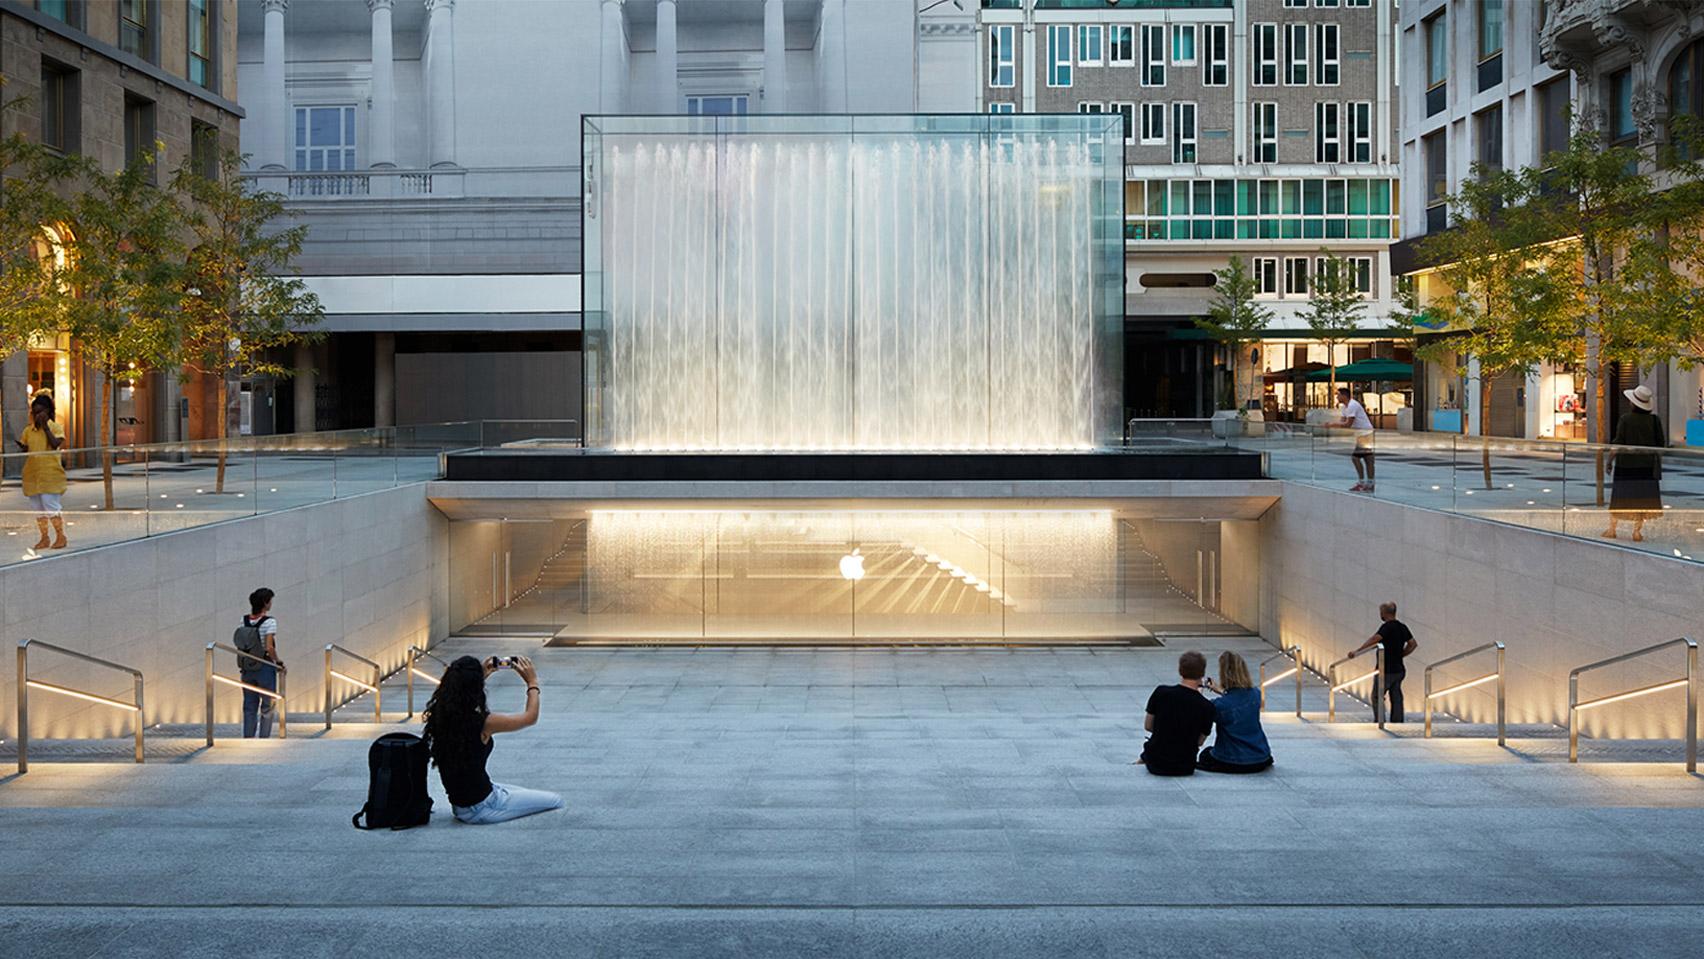 Фонтан над входом в Apple в Милане